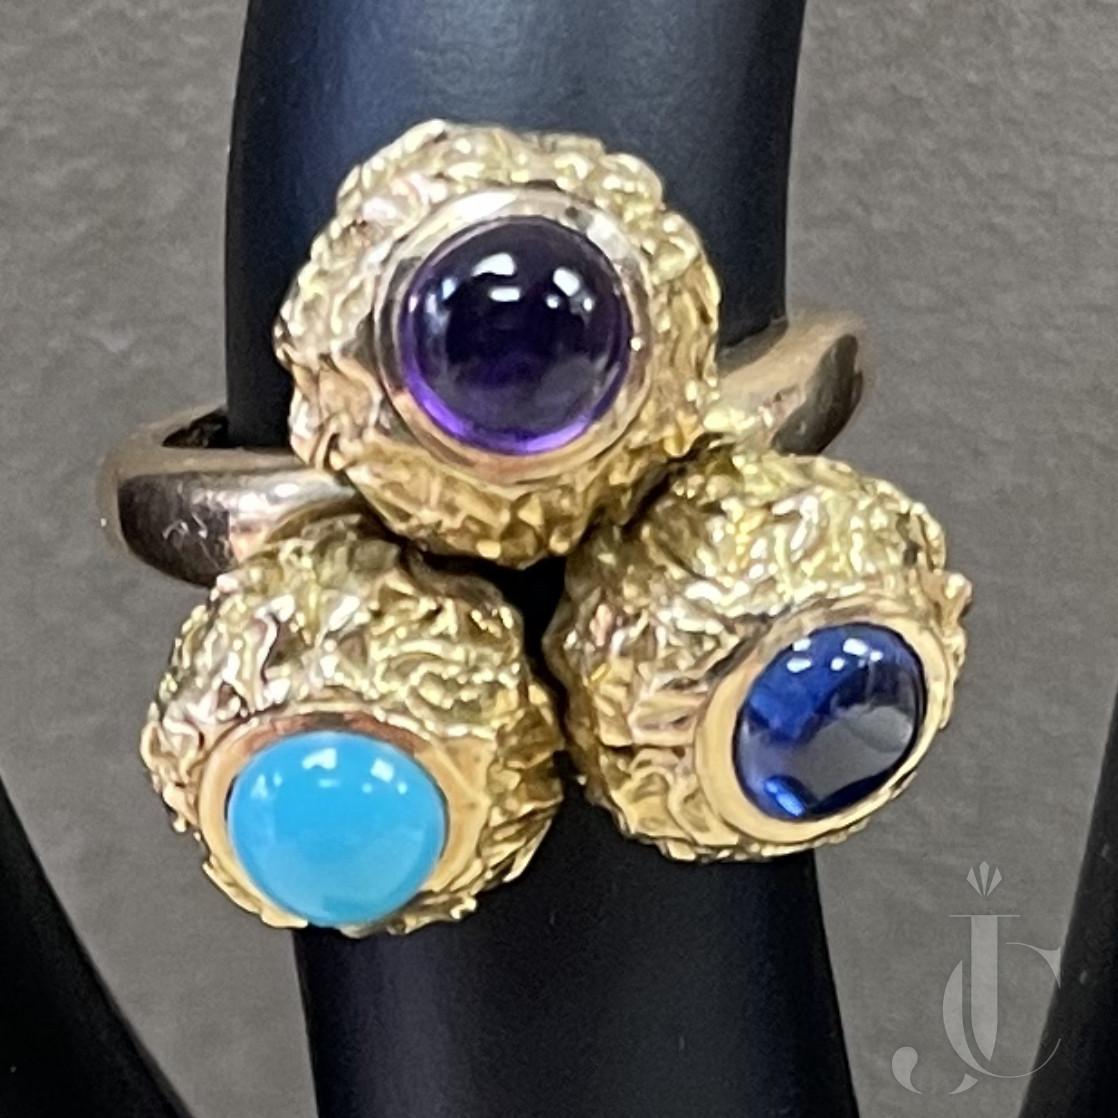 Cartier 18KT YG Sapphire, Amethyst, Turqoise ring